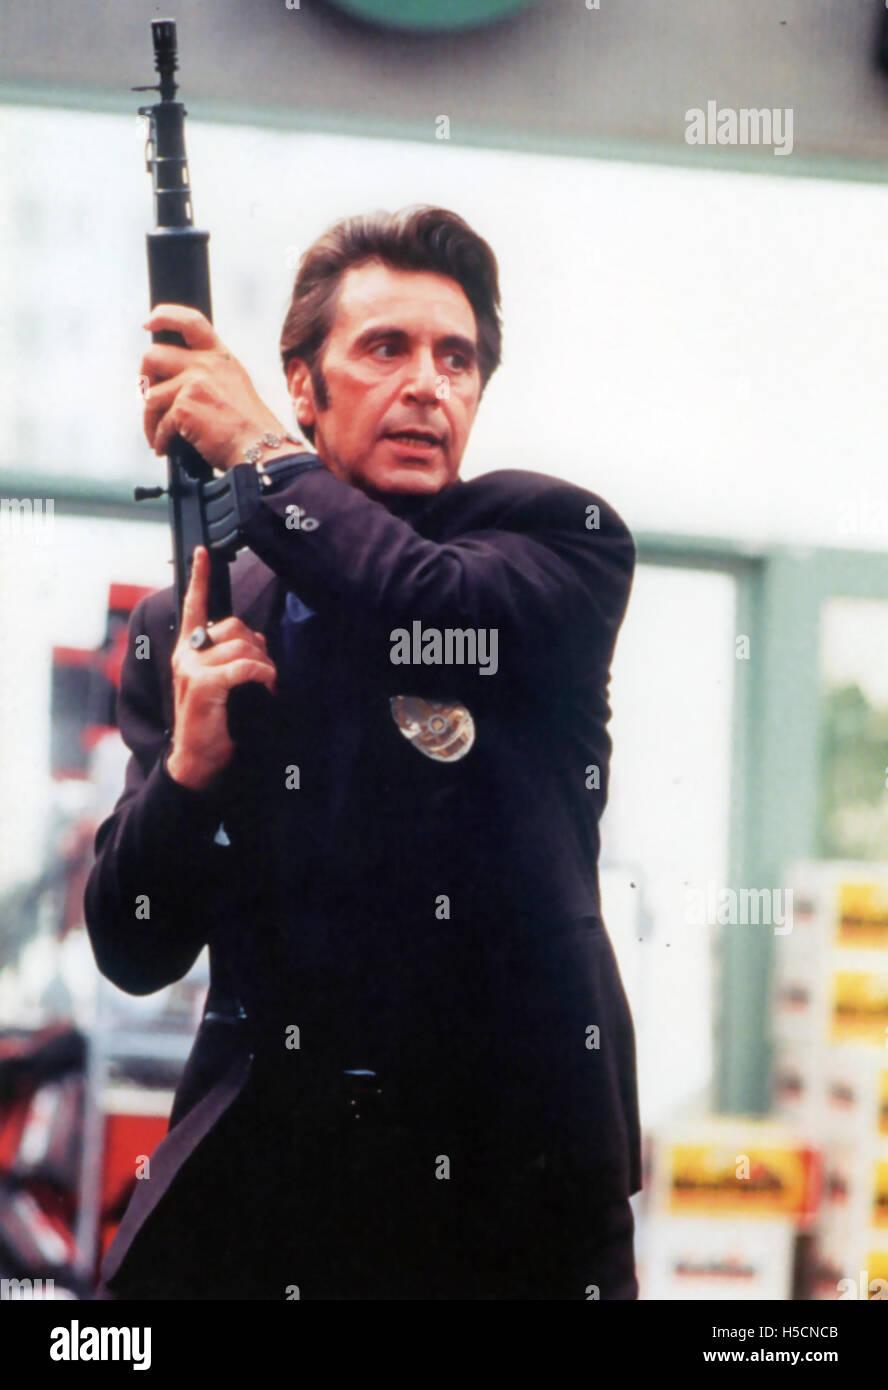 HEAT 1995  Warner Bros film with Al Pacino - Stock Image